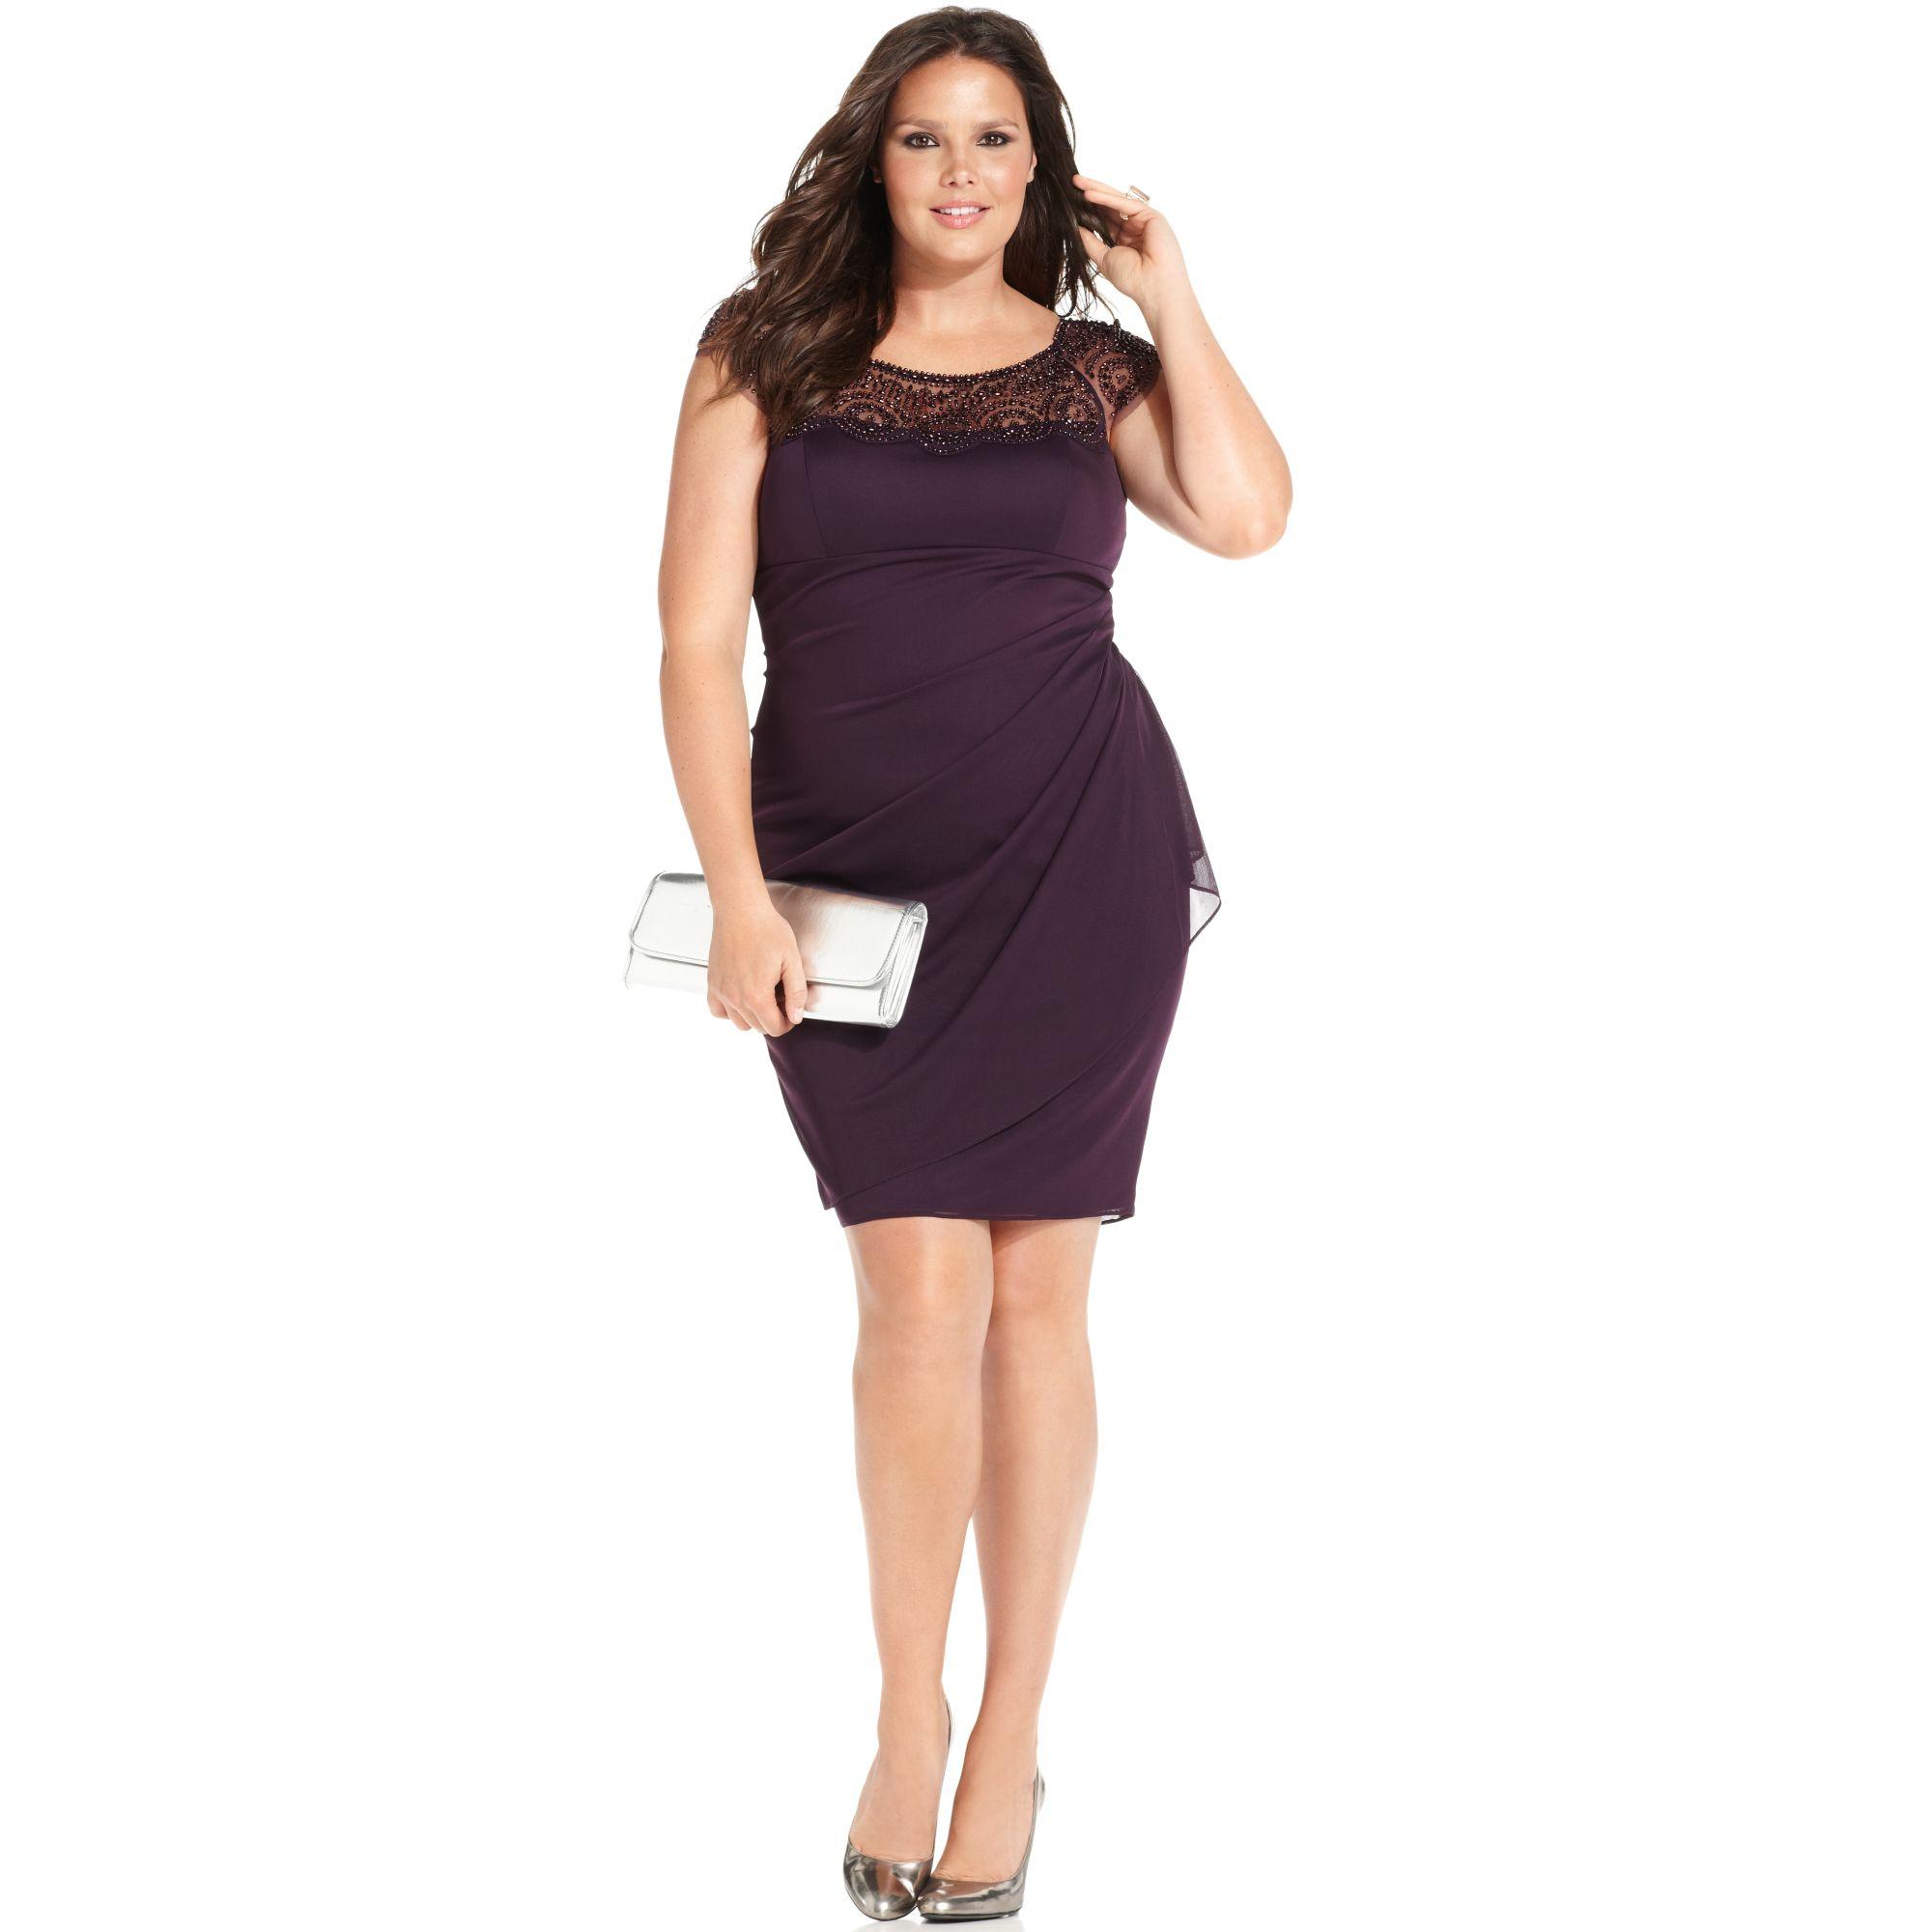 Xscape Xscape Plus Size Dress Capsleeve Beaded in Purple - Lyst